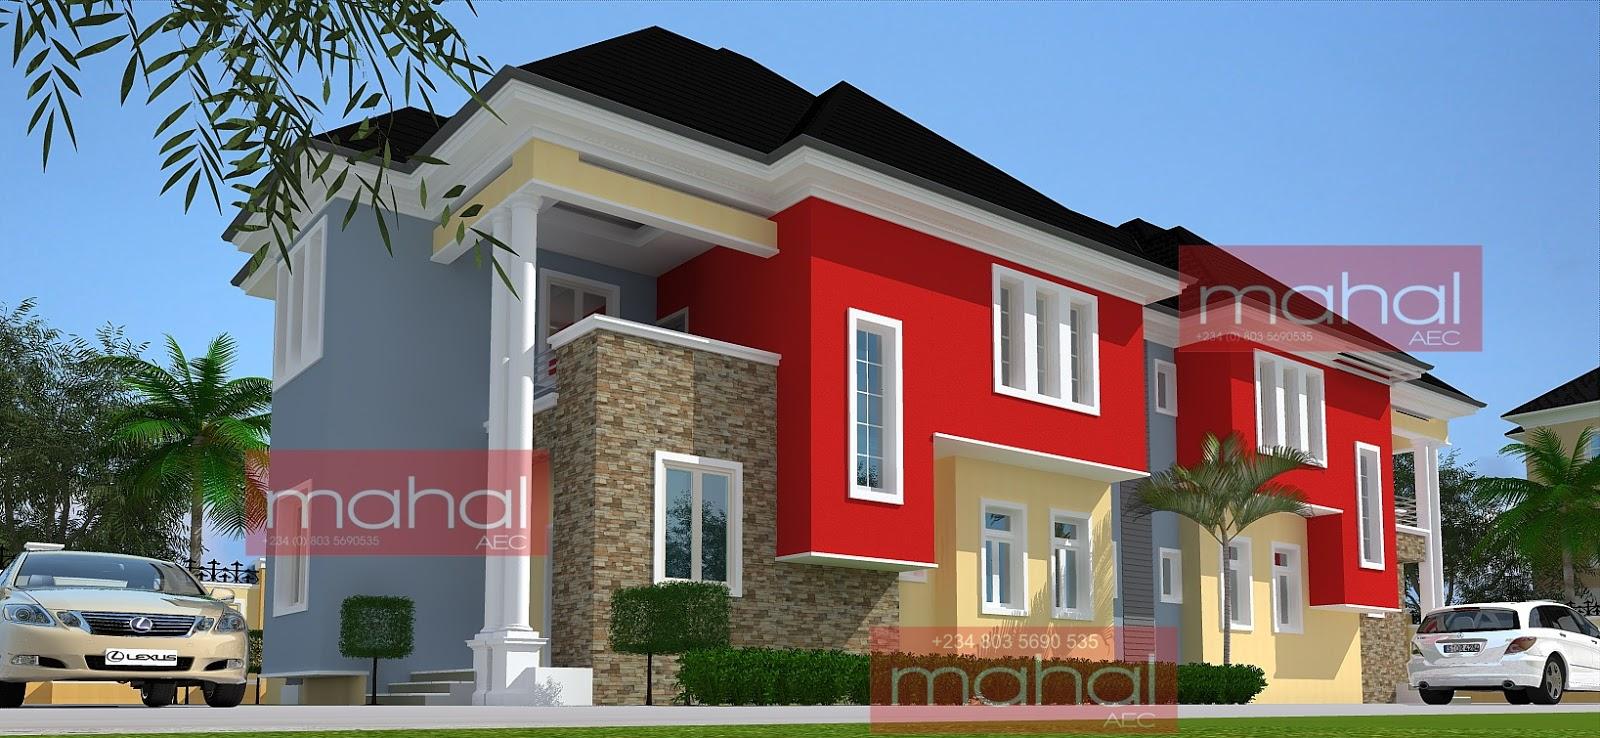 Contemporary nigerian residential architecture p uwa for Nigerian architectural designs duplex